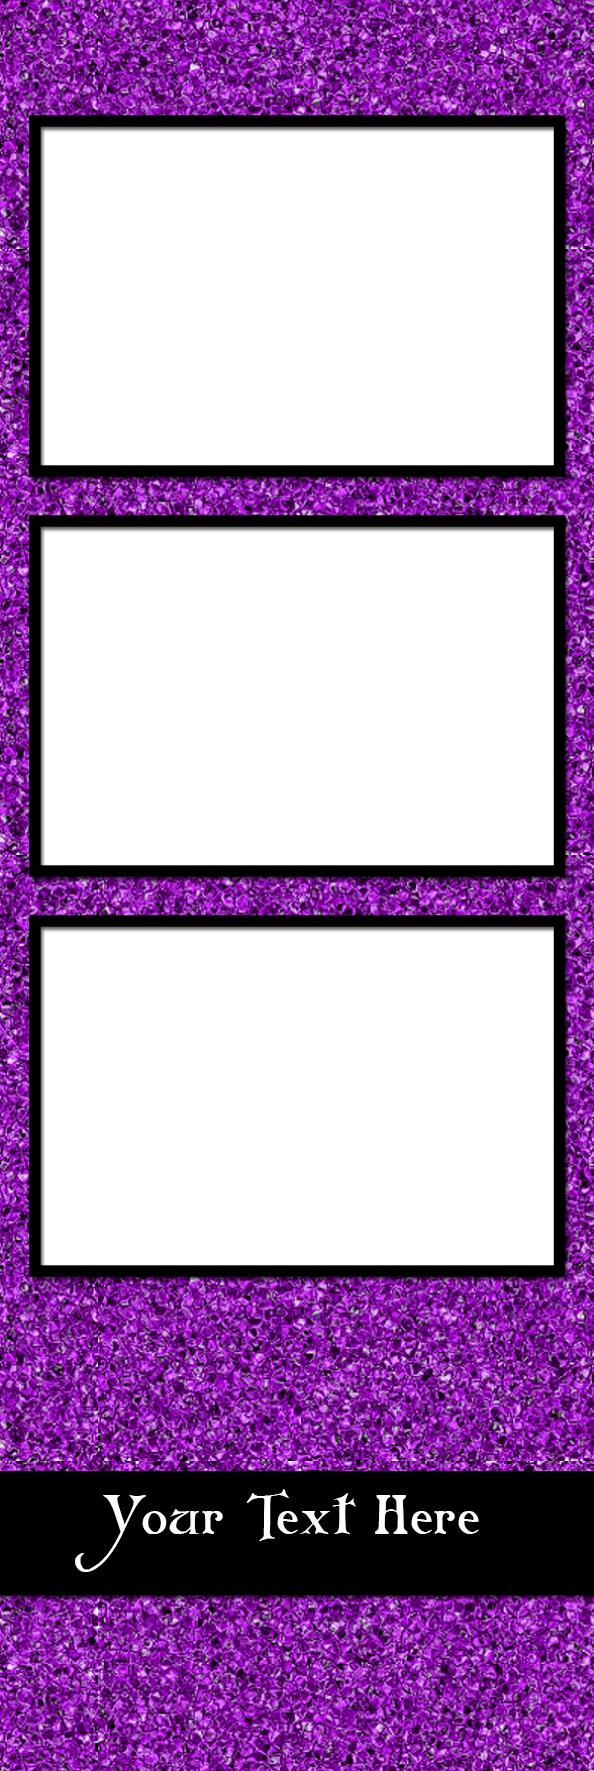 Texture_Glitter-V-6P11.jpg